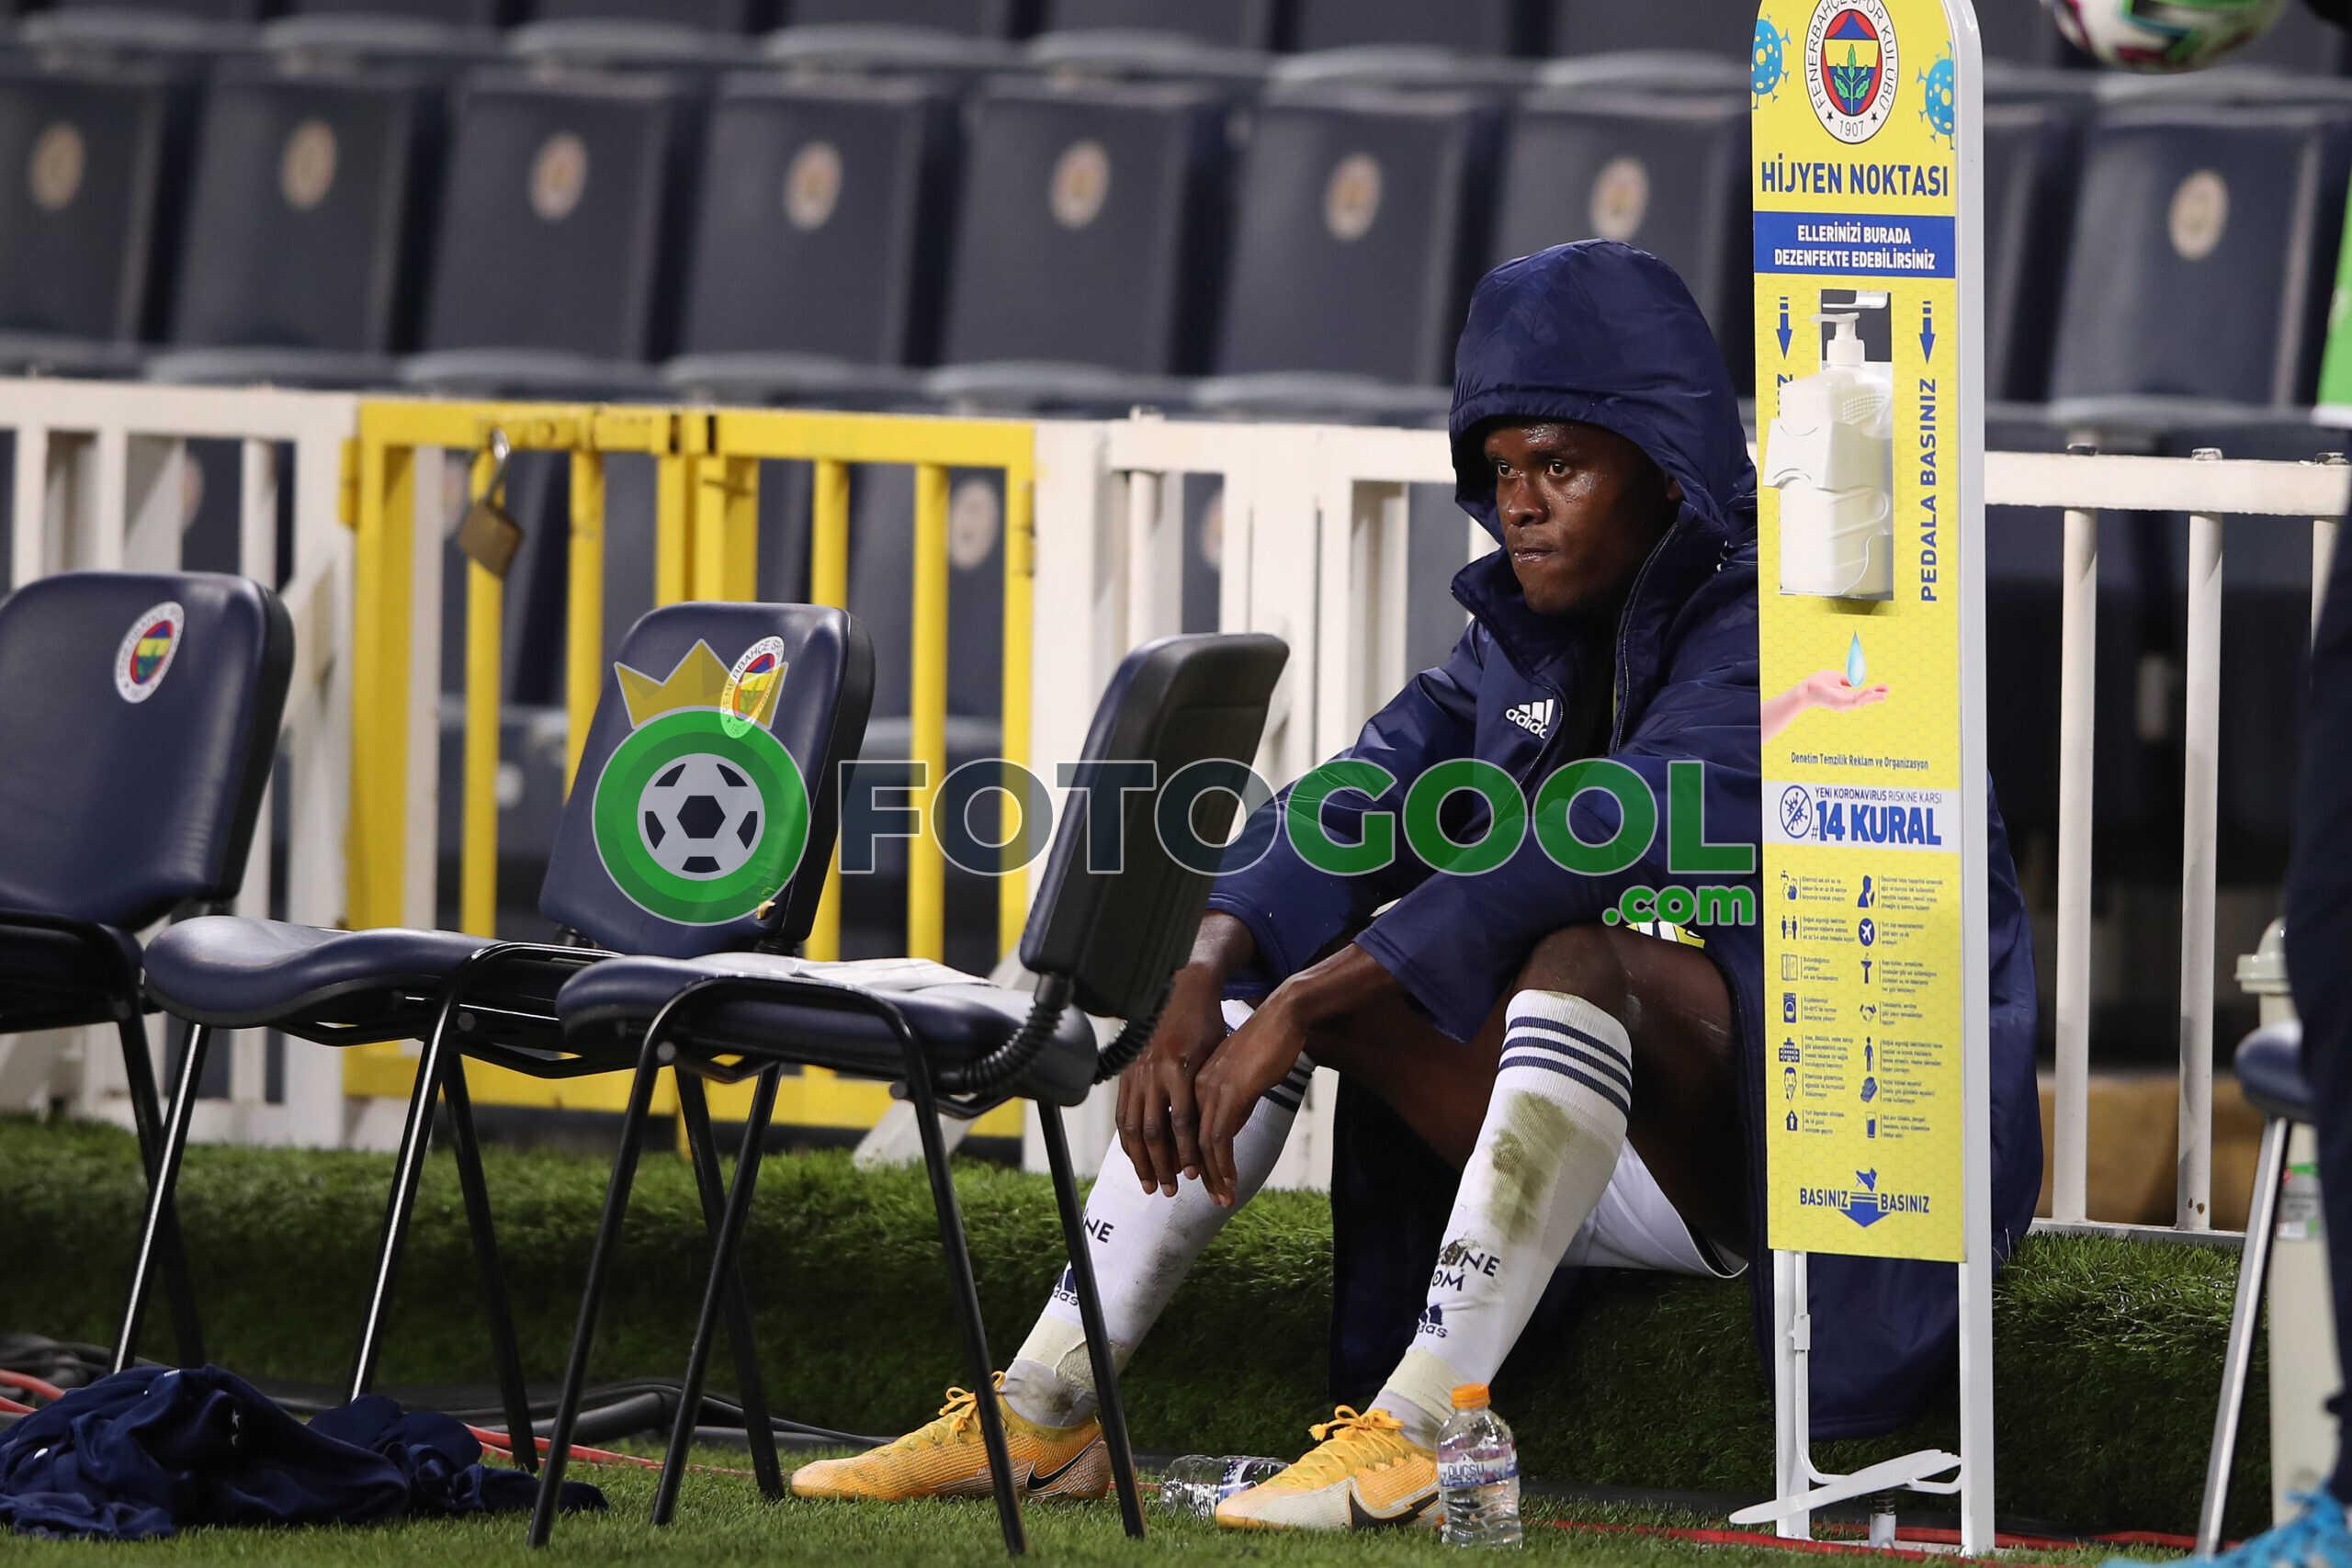 Mbwana Samatta gol oruçunu bozamadı